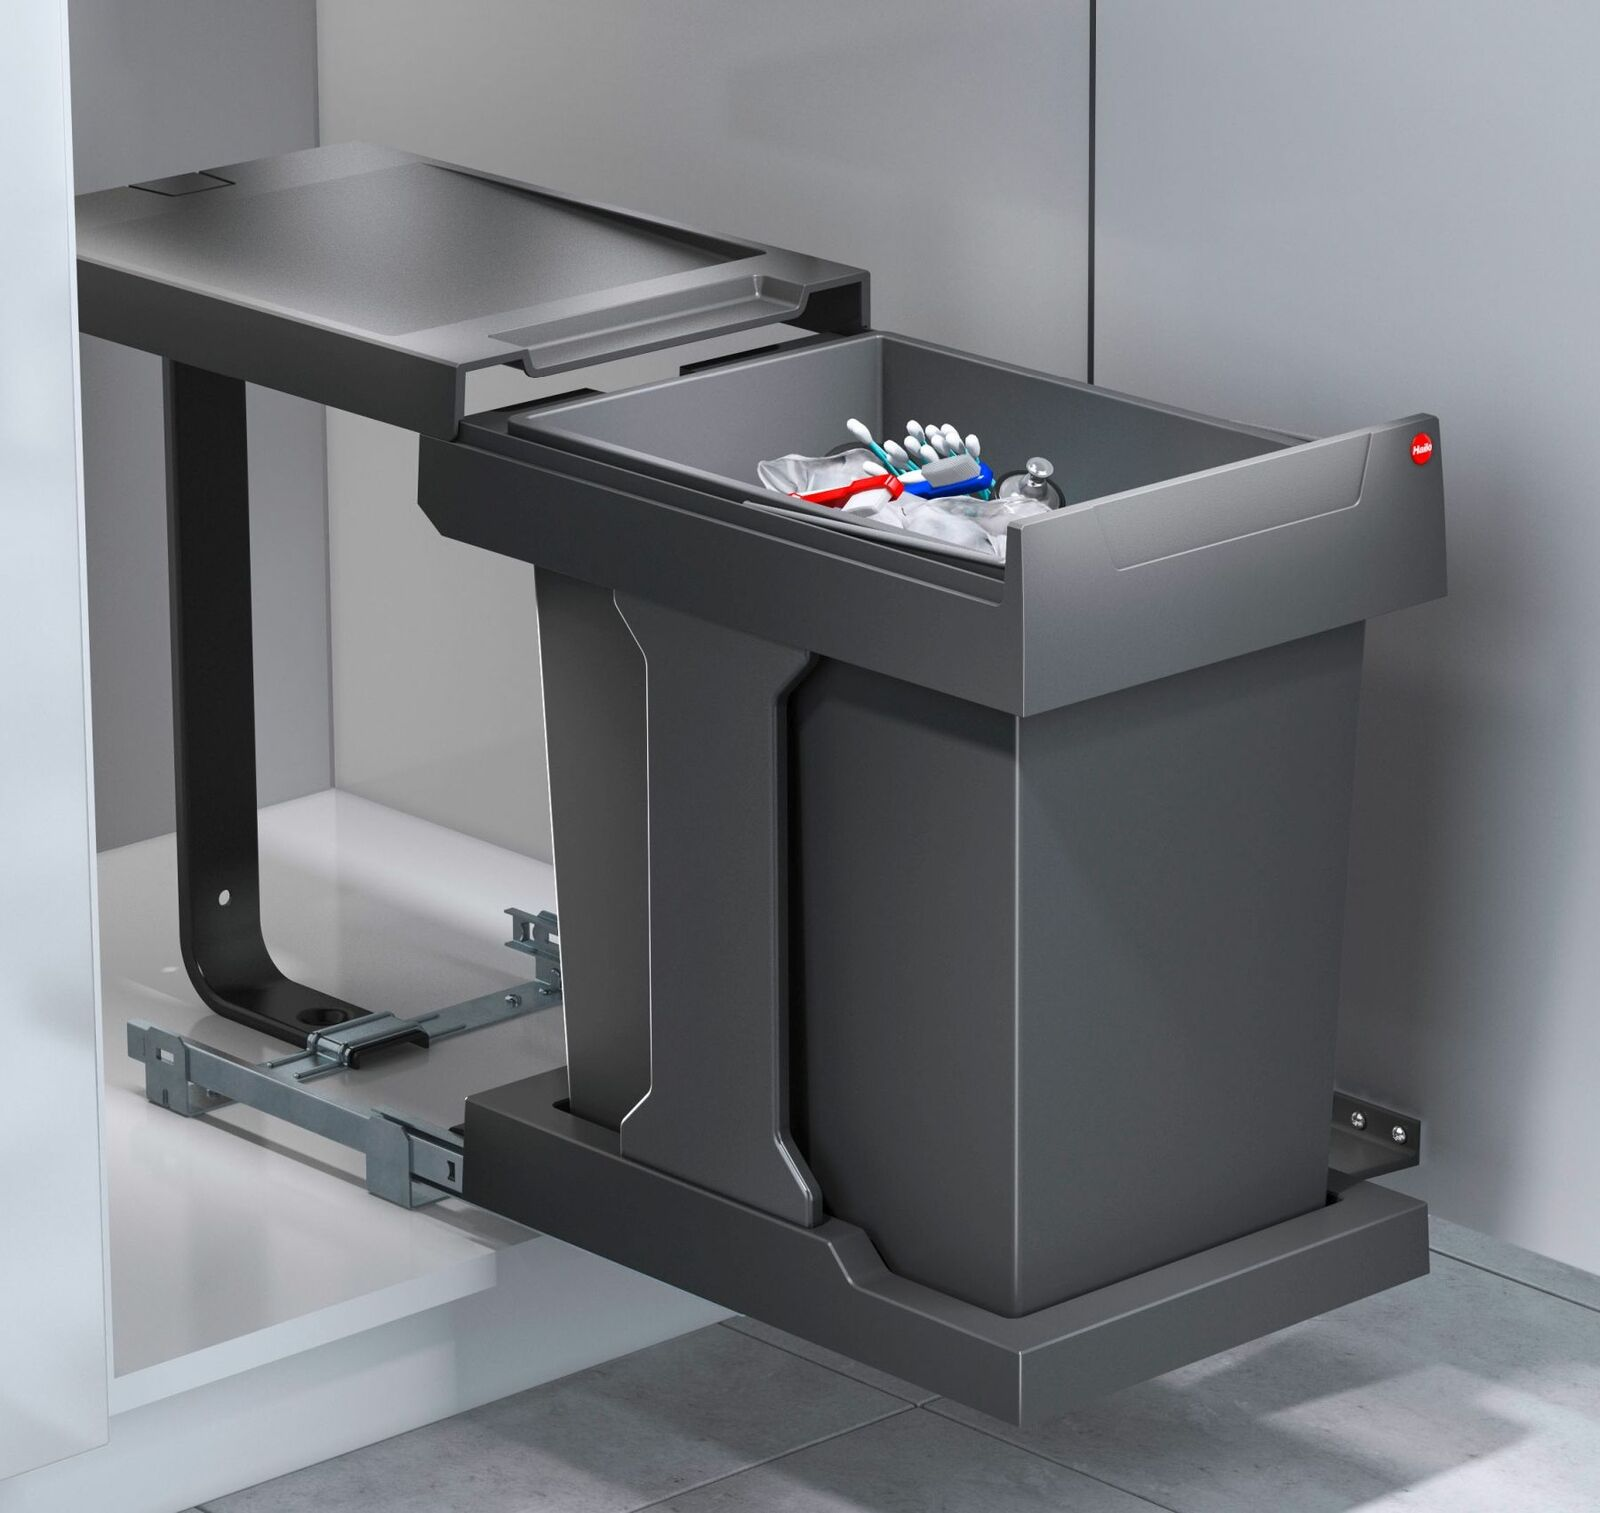 Abfalleimer Küche Ausfahrautomatik Mülleimer Einbau ab 20 cm 20x20 Liter  *5766206